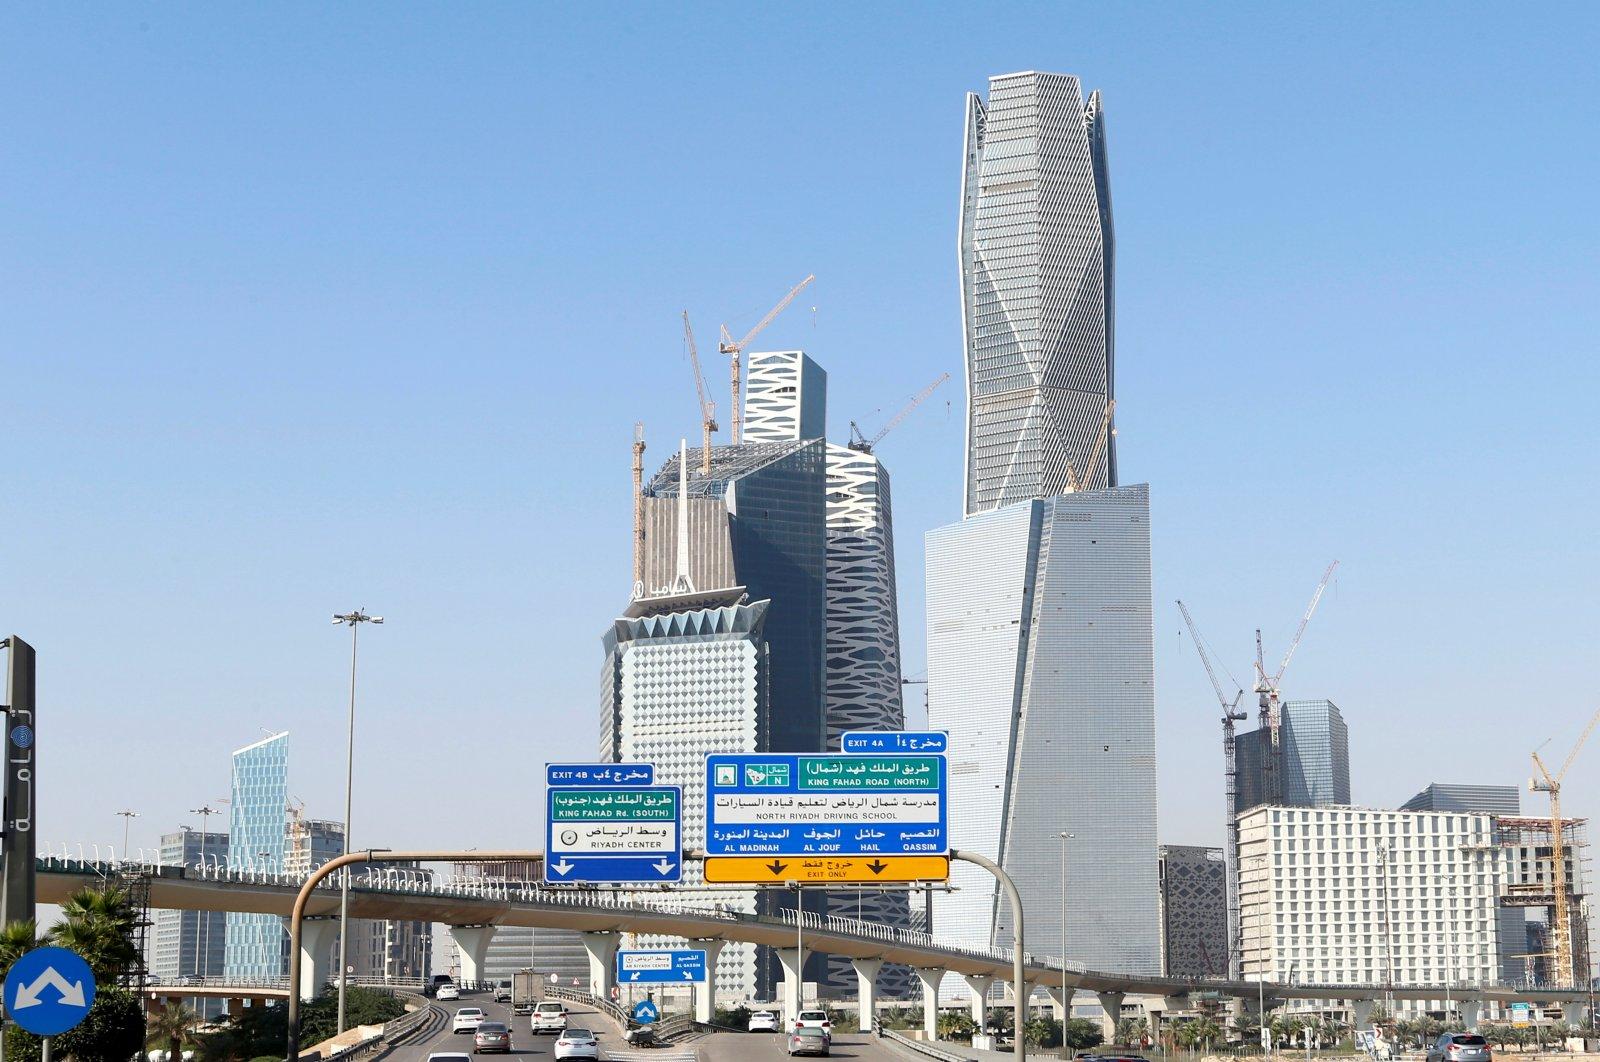 Cars drive past the King Abdullah Financial District in Riyadh, Saudi Arabia, Dec. 18, 2018. (Reuters Photo)